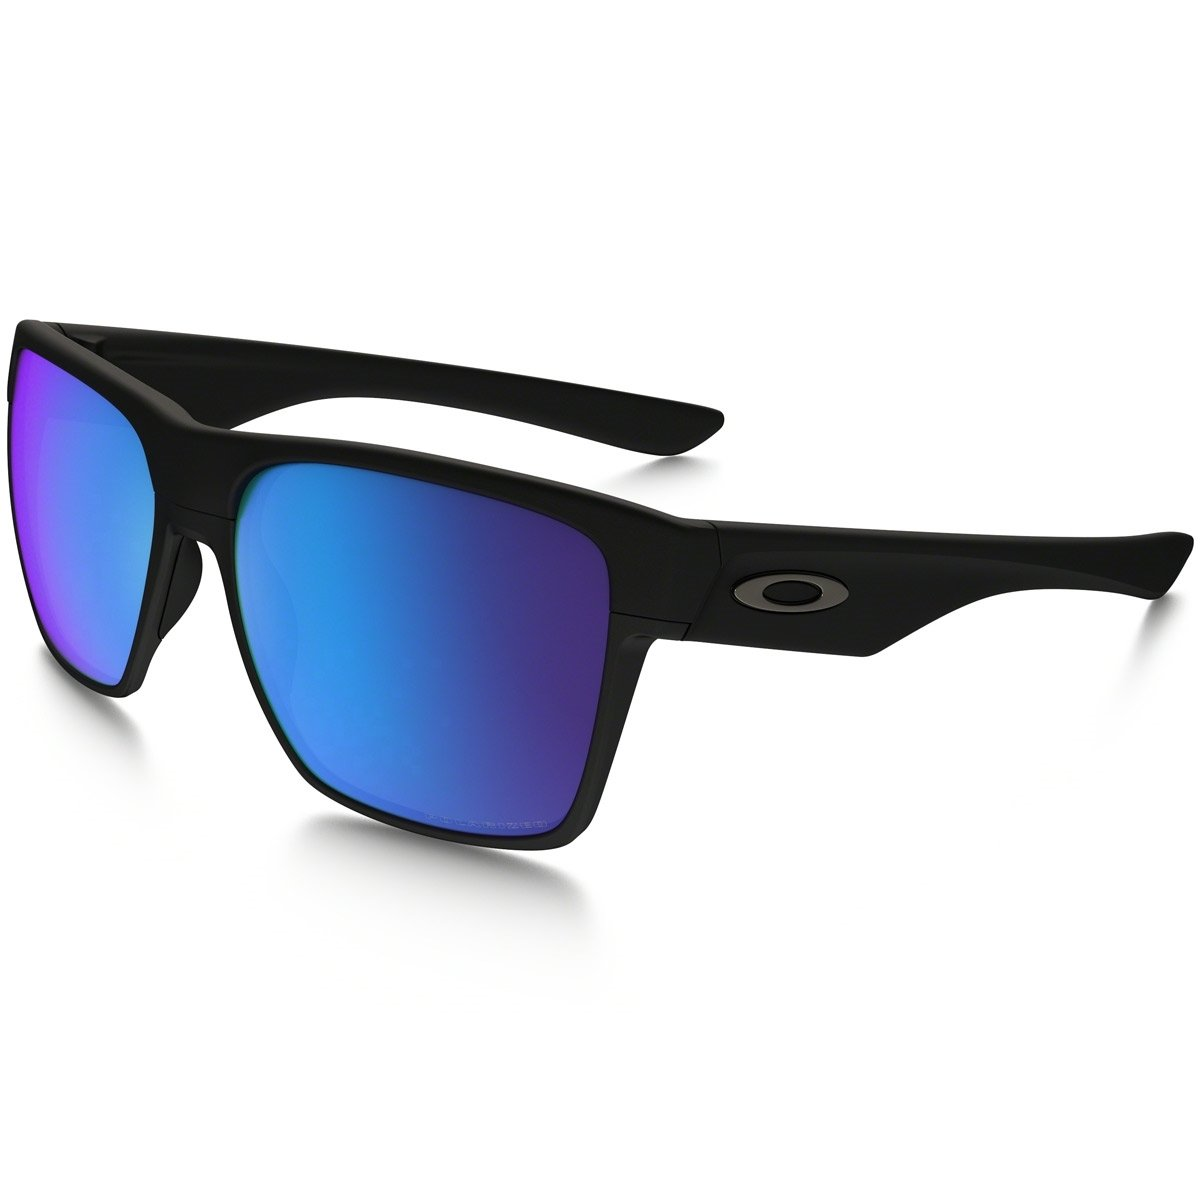 08491dfa82d6d Óculos Oakley Twoface Xl - Matte Black   Sapphire Iridium Polarized -  Compre Agora